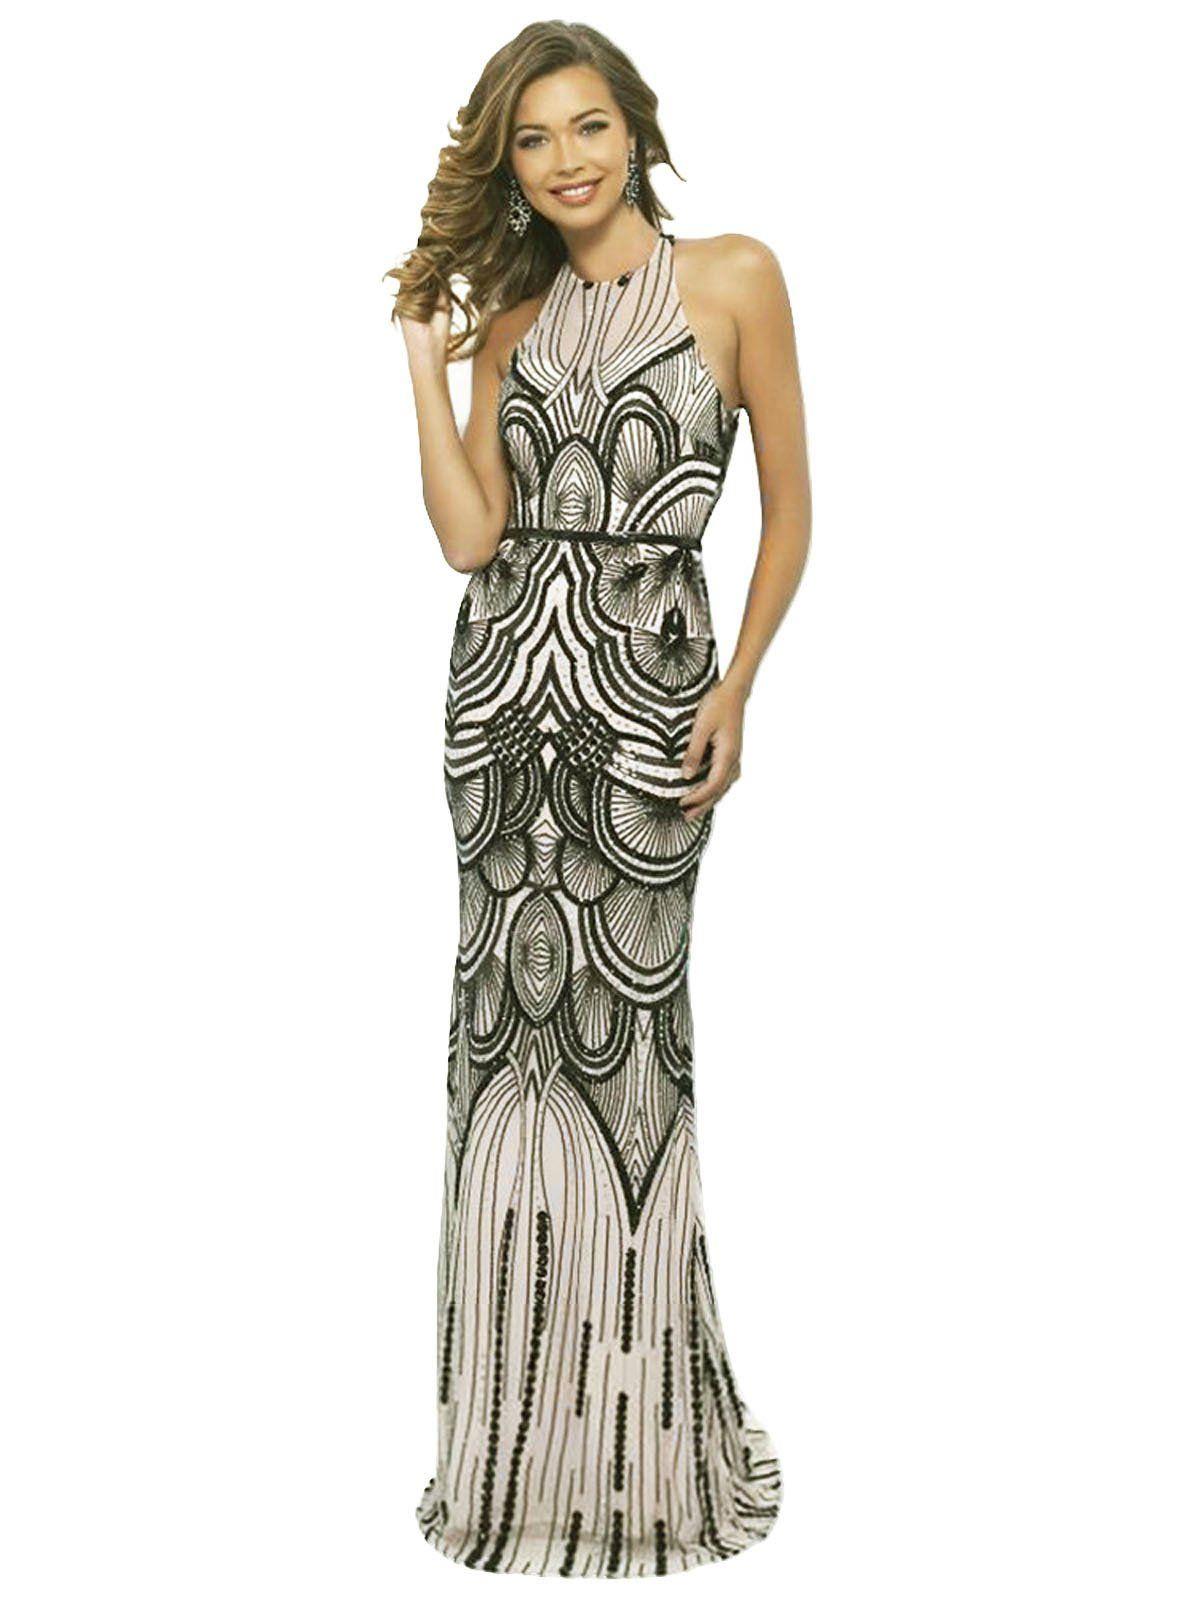 1920s Sequin Backless Formal Dress Backless Evening Dress Backless Dress Formal Evening Dresses [ 1600 x 1200 Pixel ]